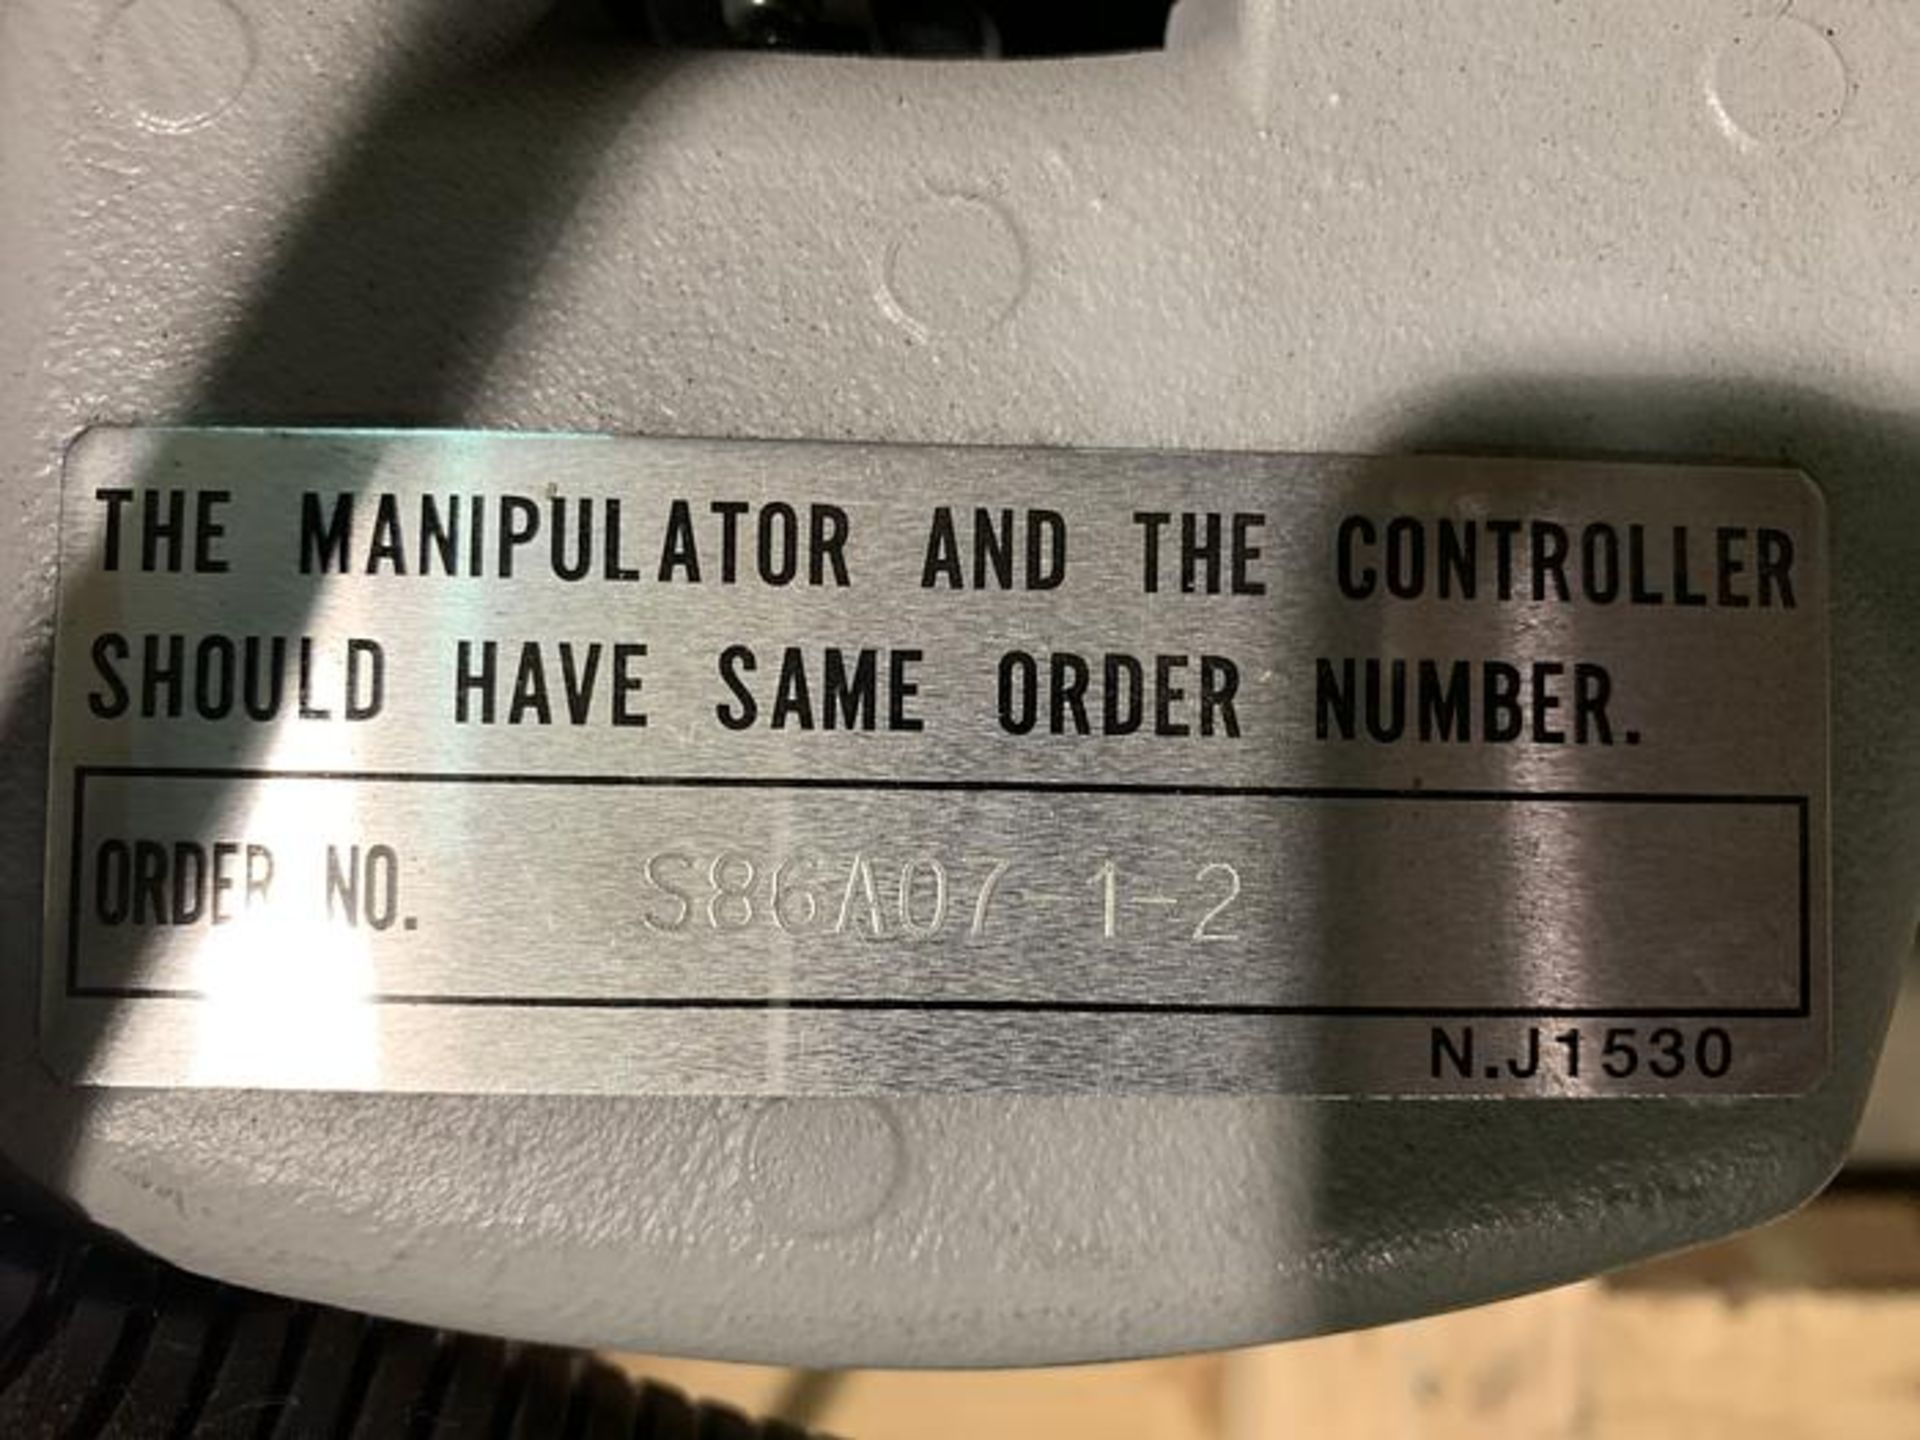 Lot 59 - MOTOMAN SSF2000 6 KG X 1,378mm REACH 6 AXIS CNC ROBOT WITH NX100 CONTROL, YEAR 2008, SN S86AO7-1-2